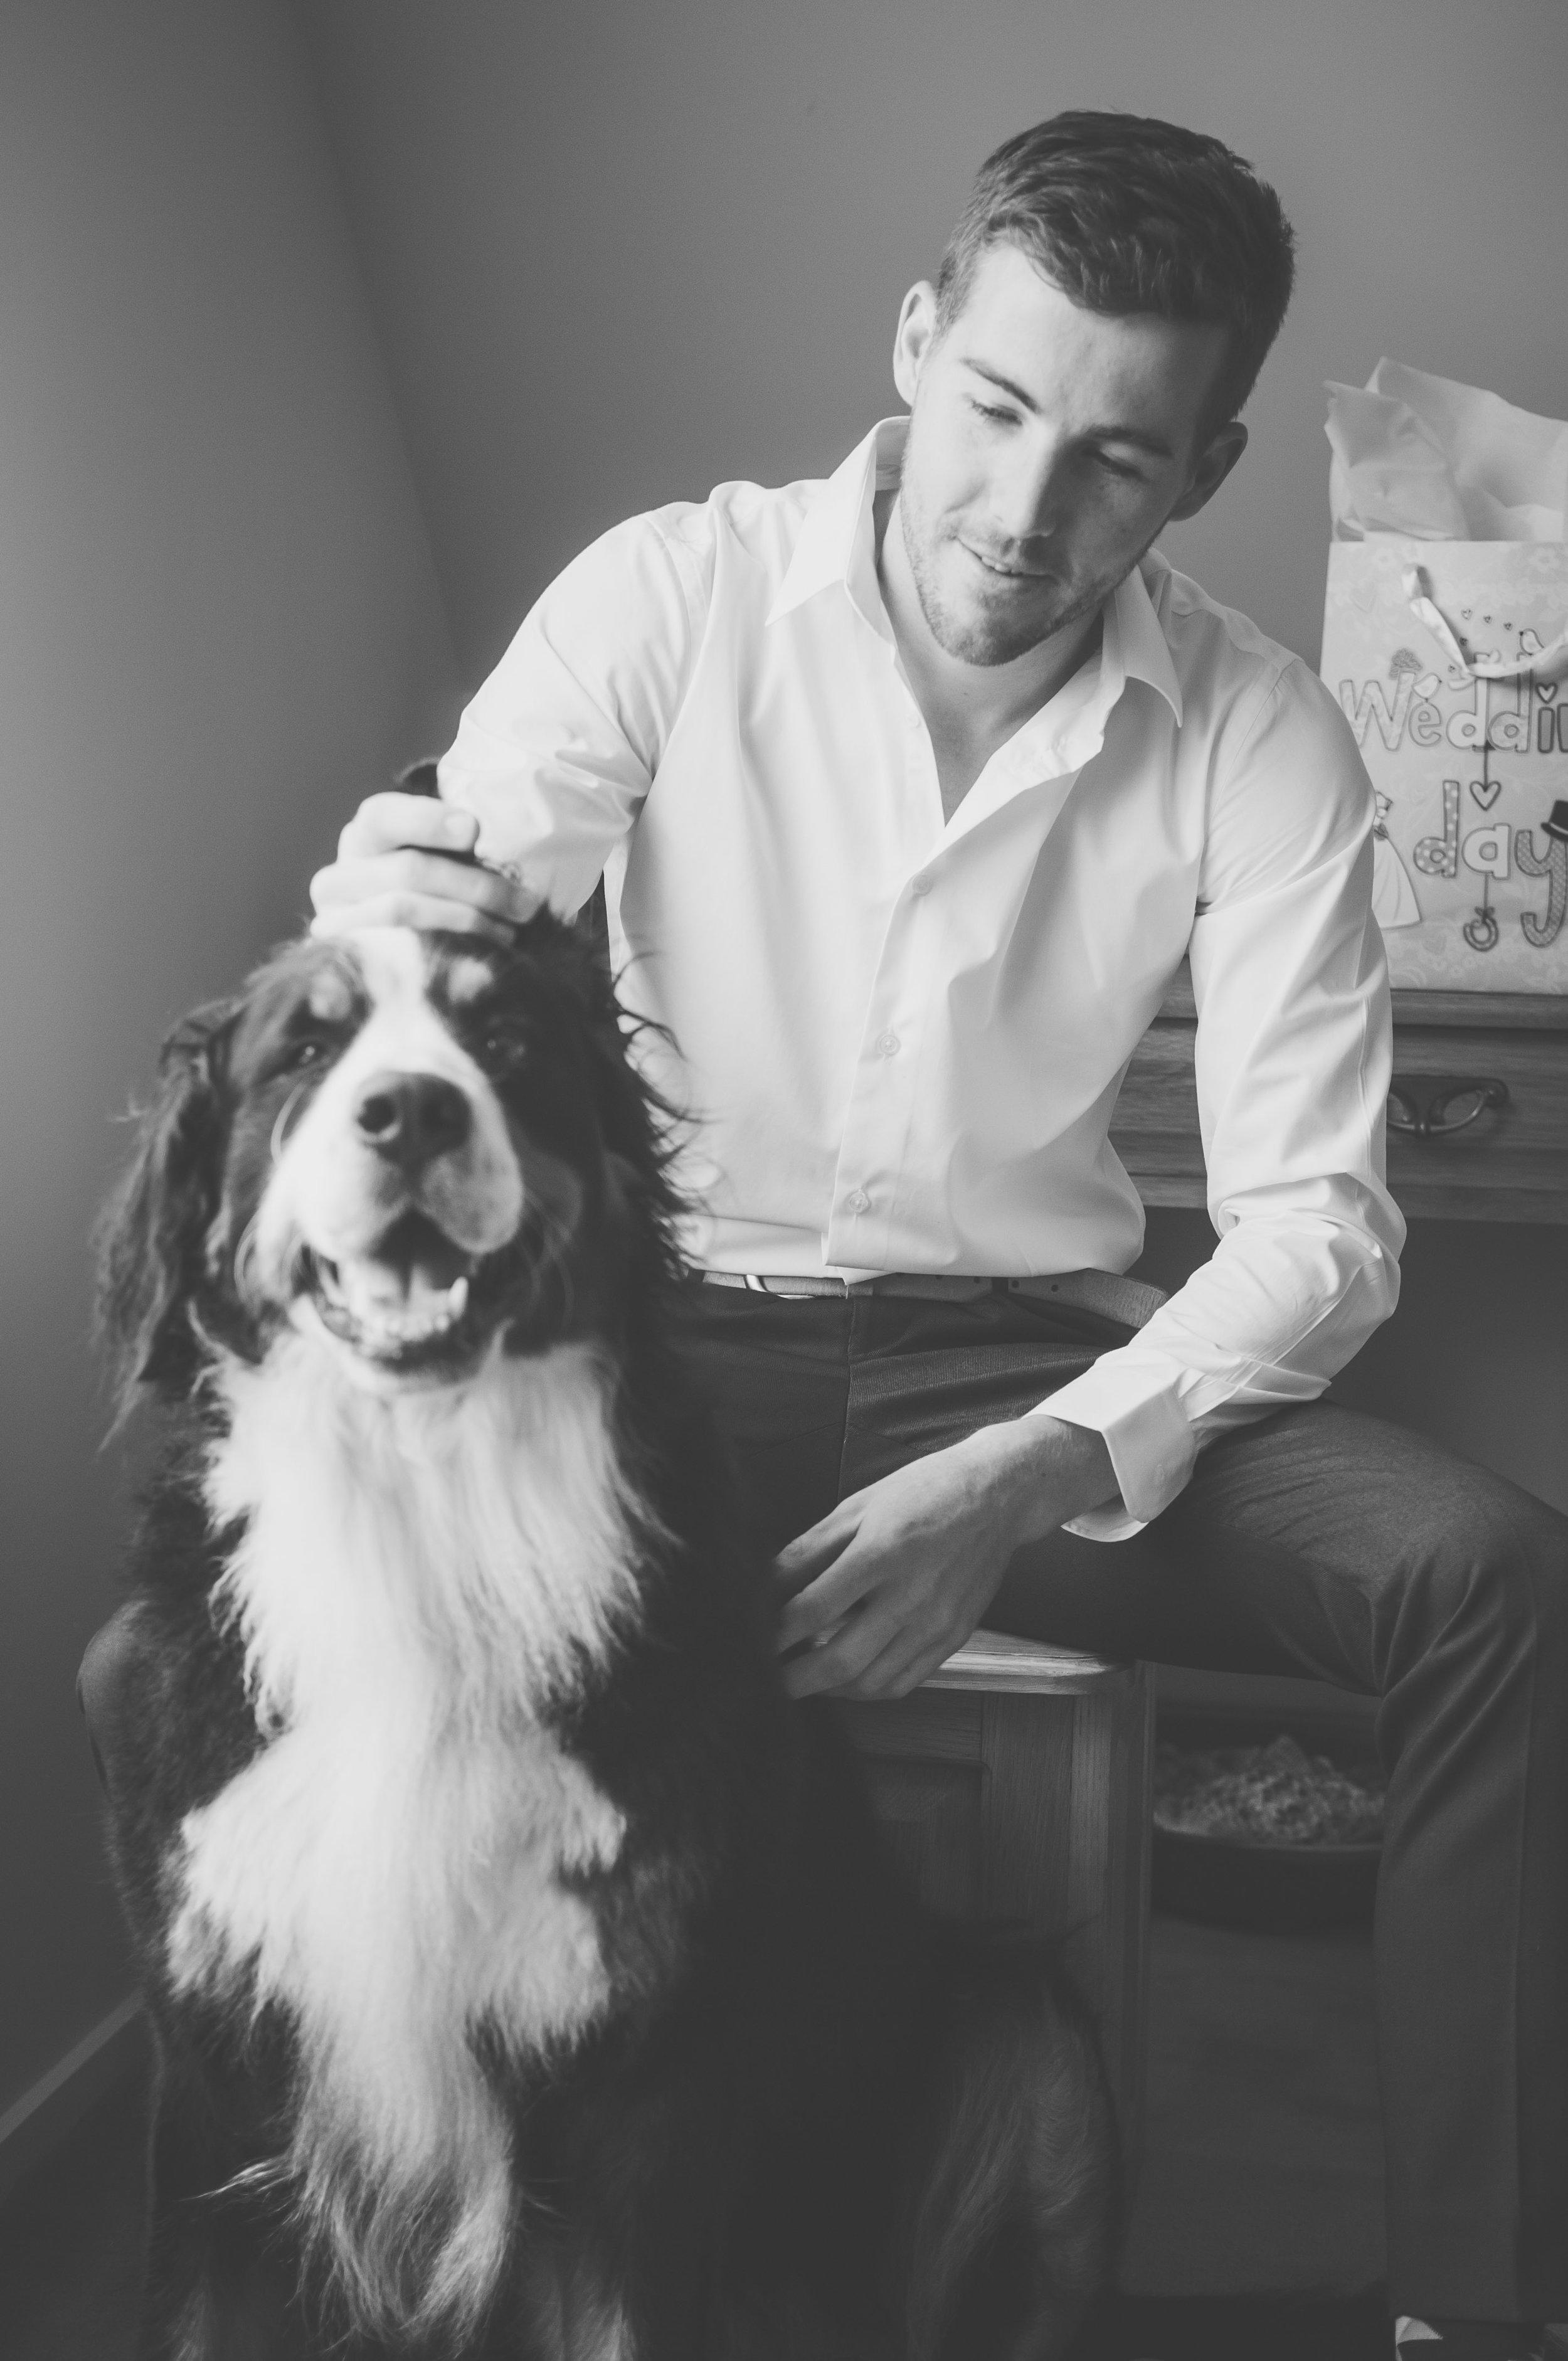 groom-and-dog.jpg